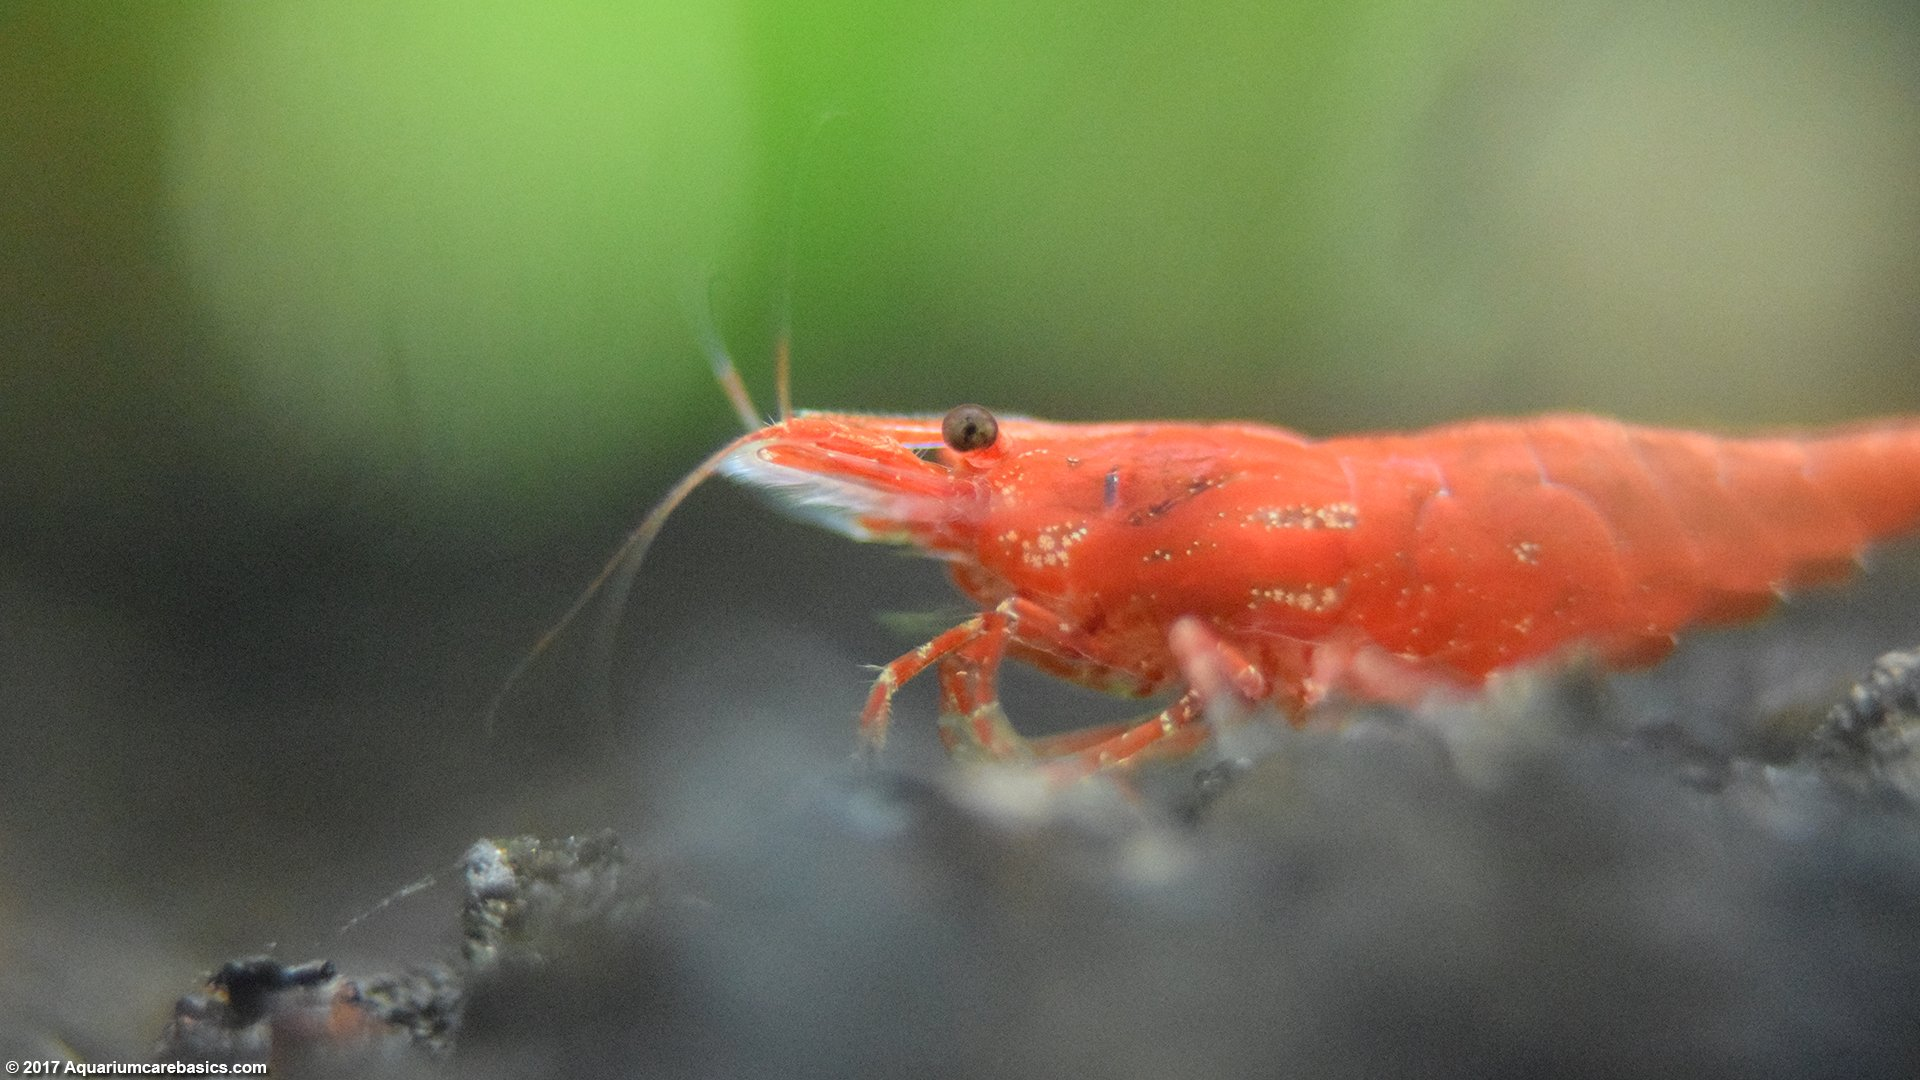 Red Cherry Shrimp, Care, Feeding, Tank Mates & Lifespan